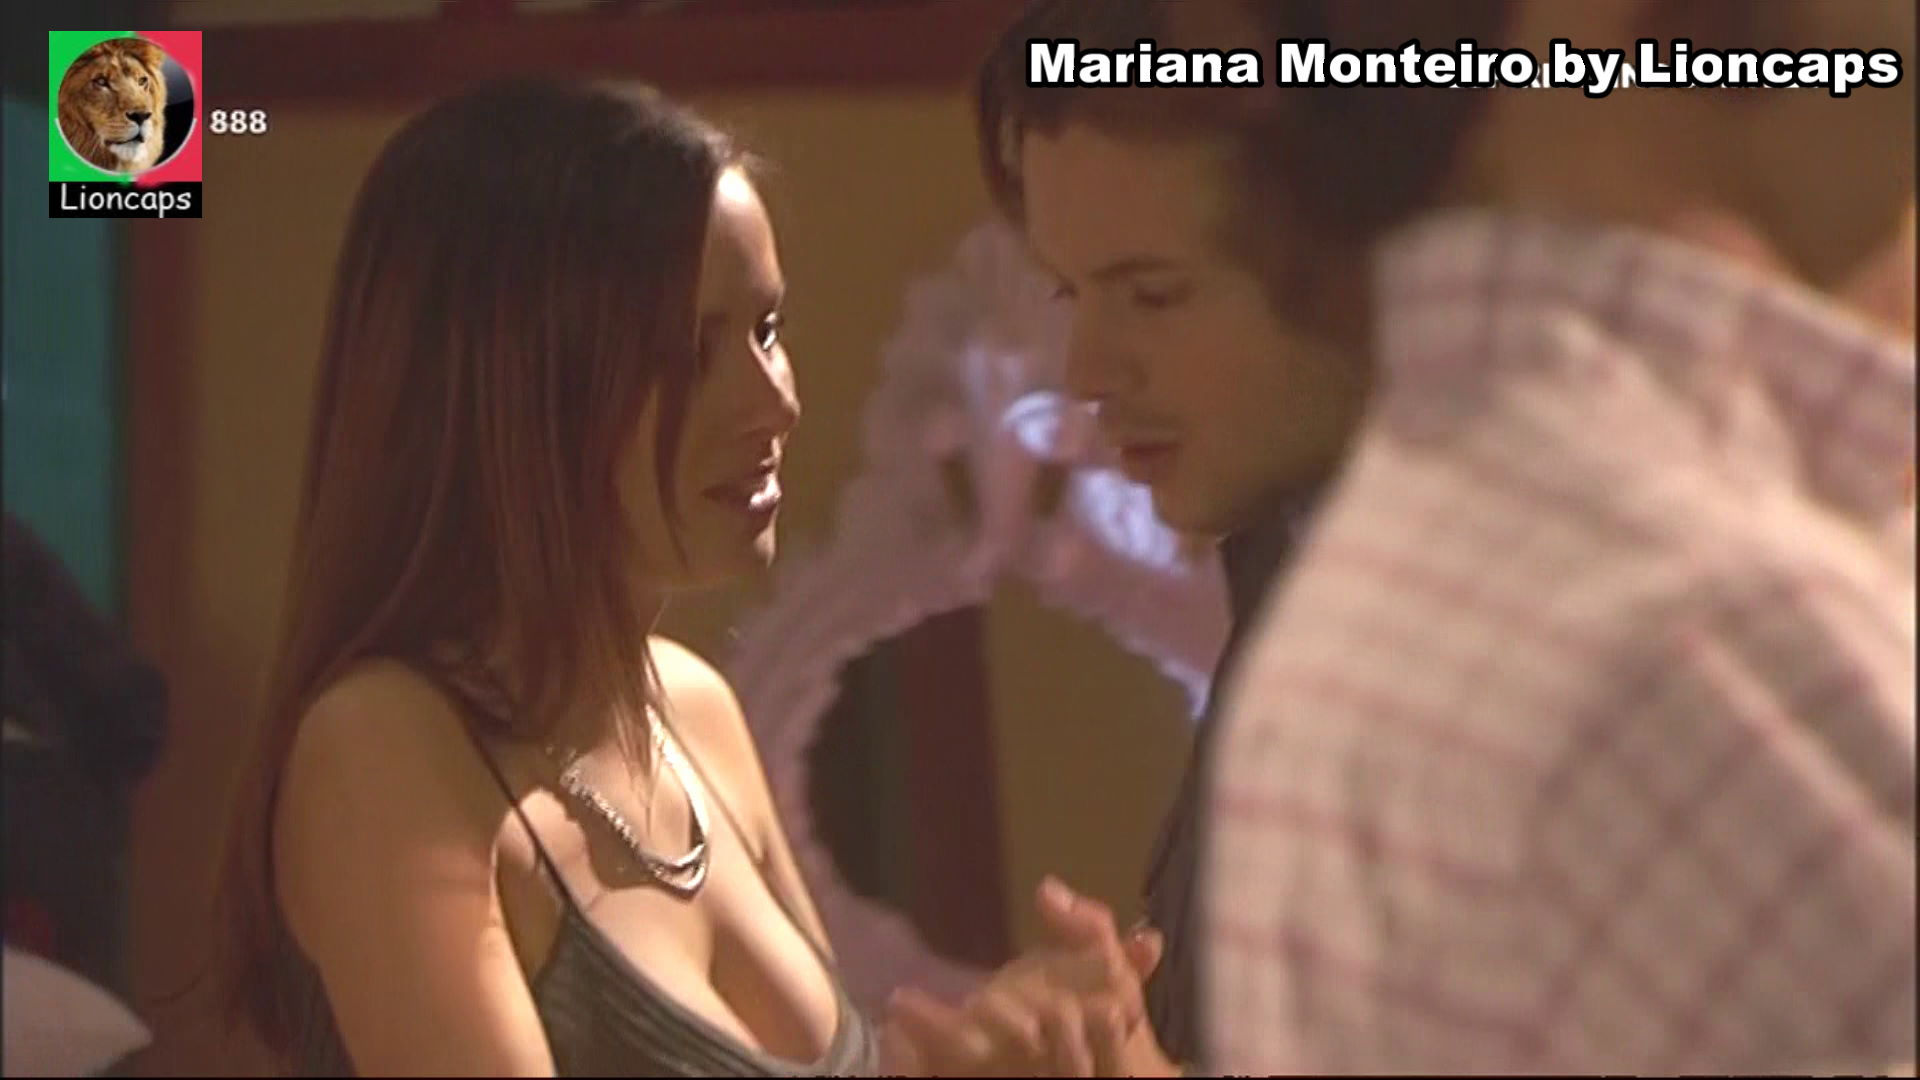 738389434_mariana_monteiro_vs190209_19219_122_386lo.JPG